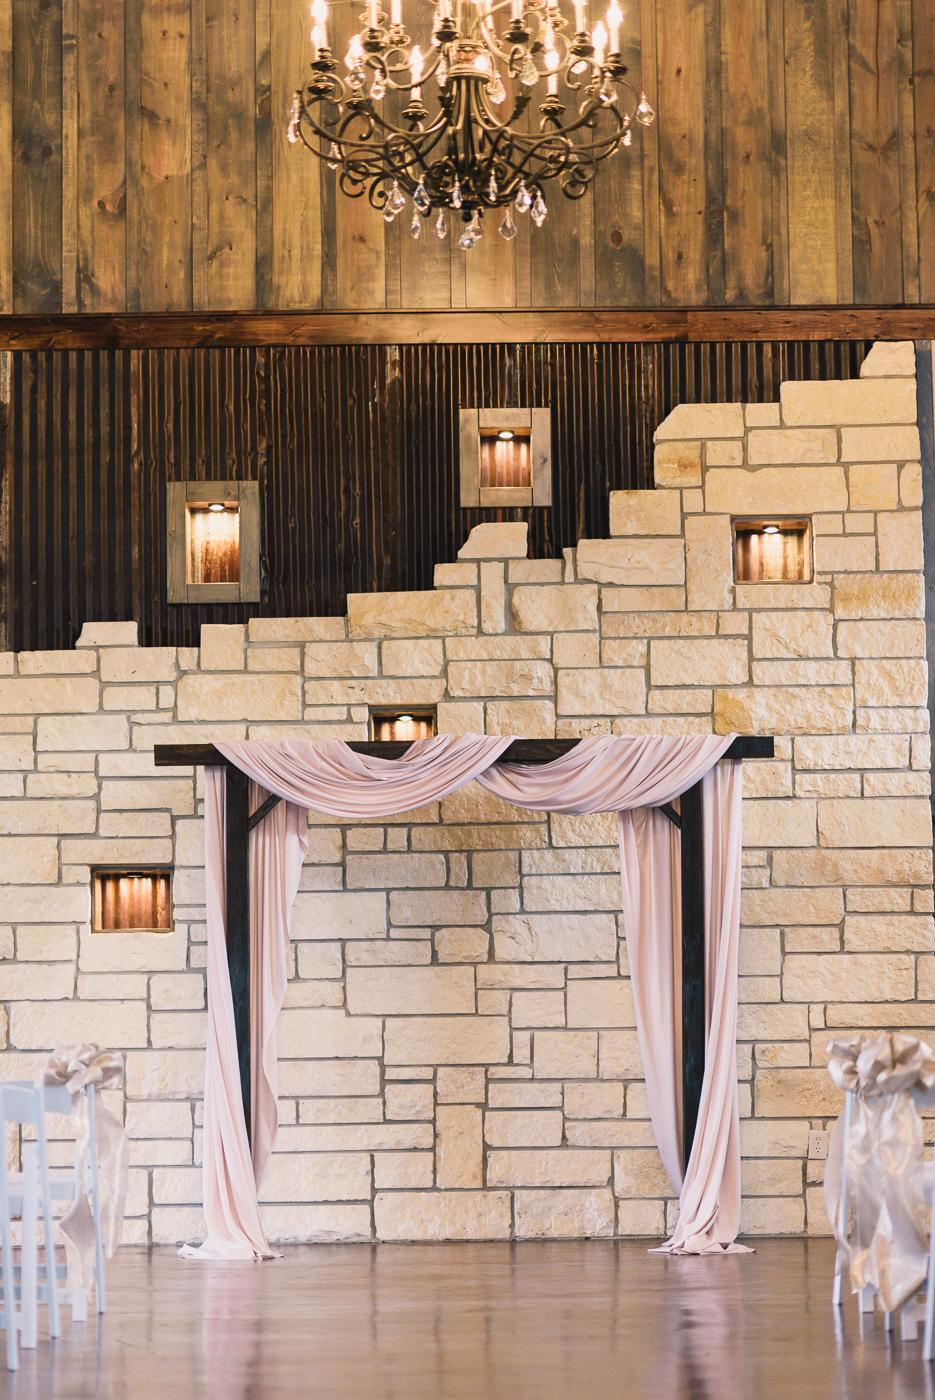 Pink wedding arch limestone wall rustic sheet metal shiplap wood pannel